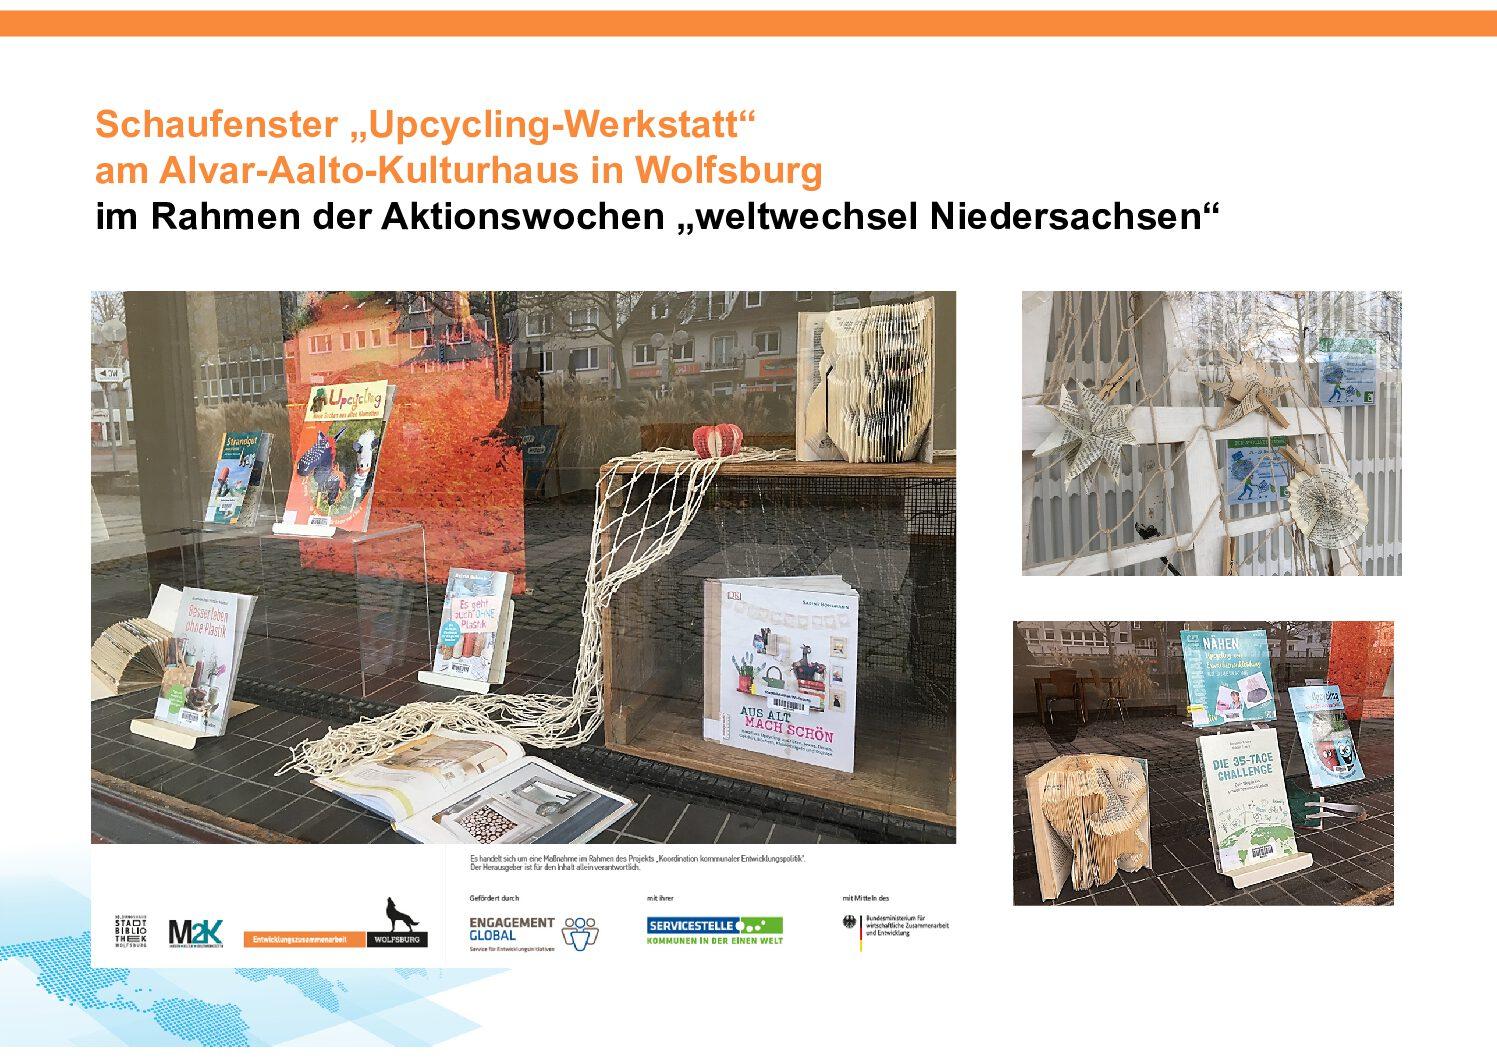 "Schaufenster ""Upcycling-Werkstatt"" am Alvar-Aalto-Kulturhaus in Wolfsburg"